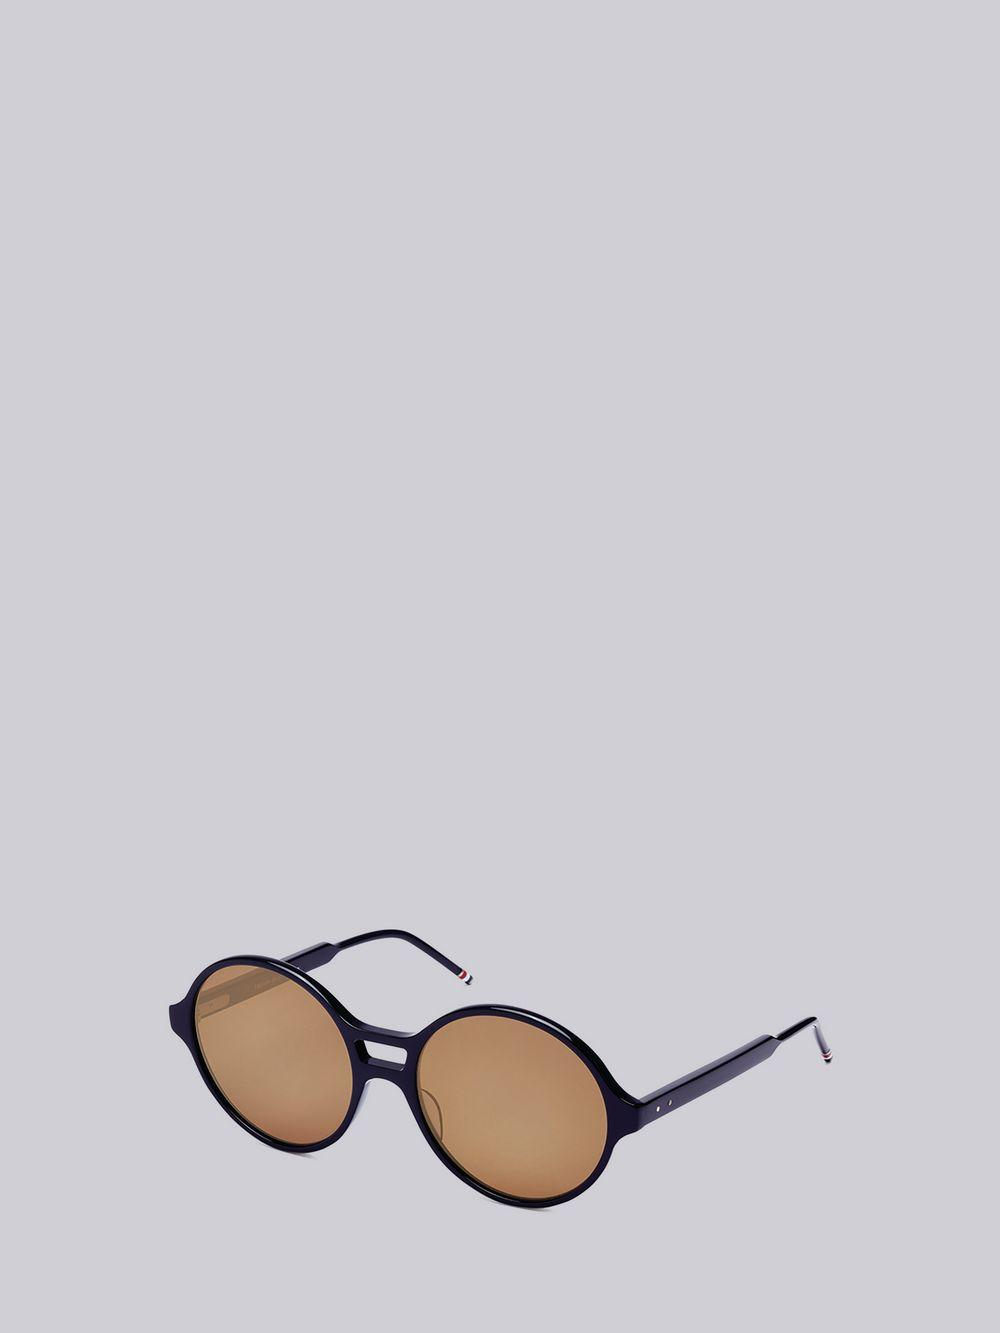 f1fe78e6120 Thom Browne Round Dark Brown Sunglasses in Blue - Lyst